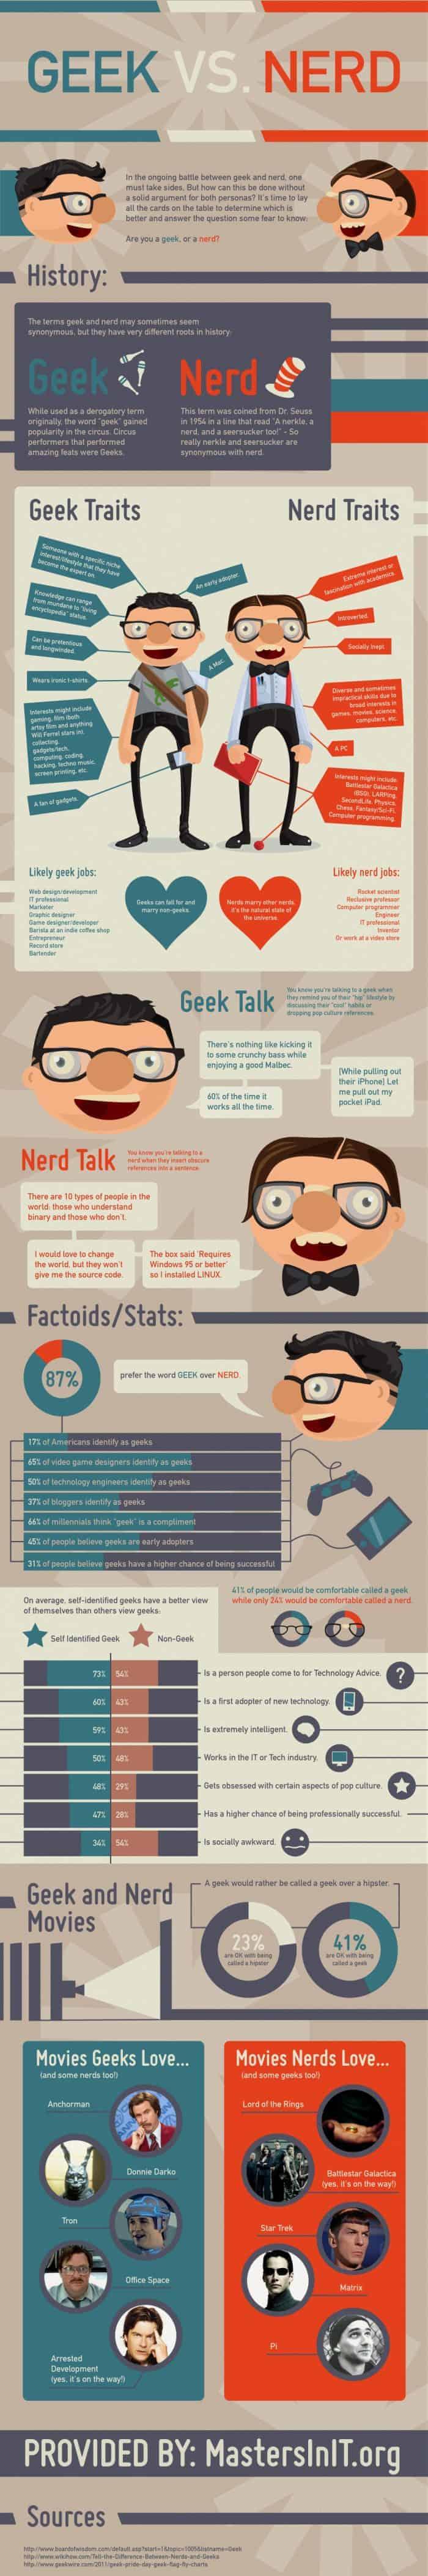 geek-nerd